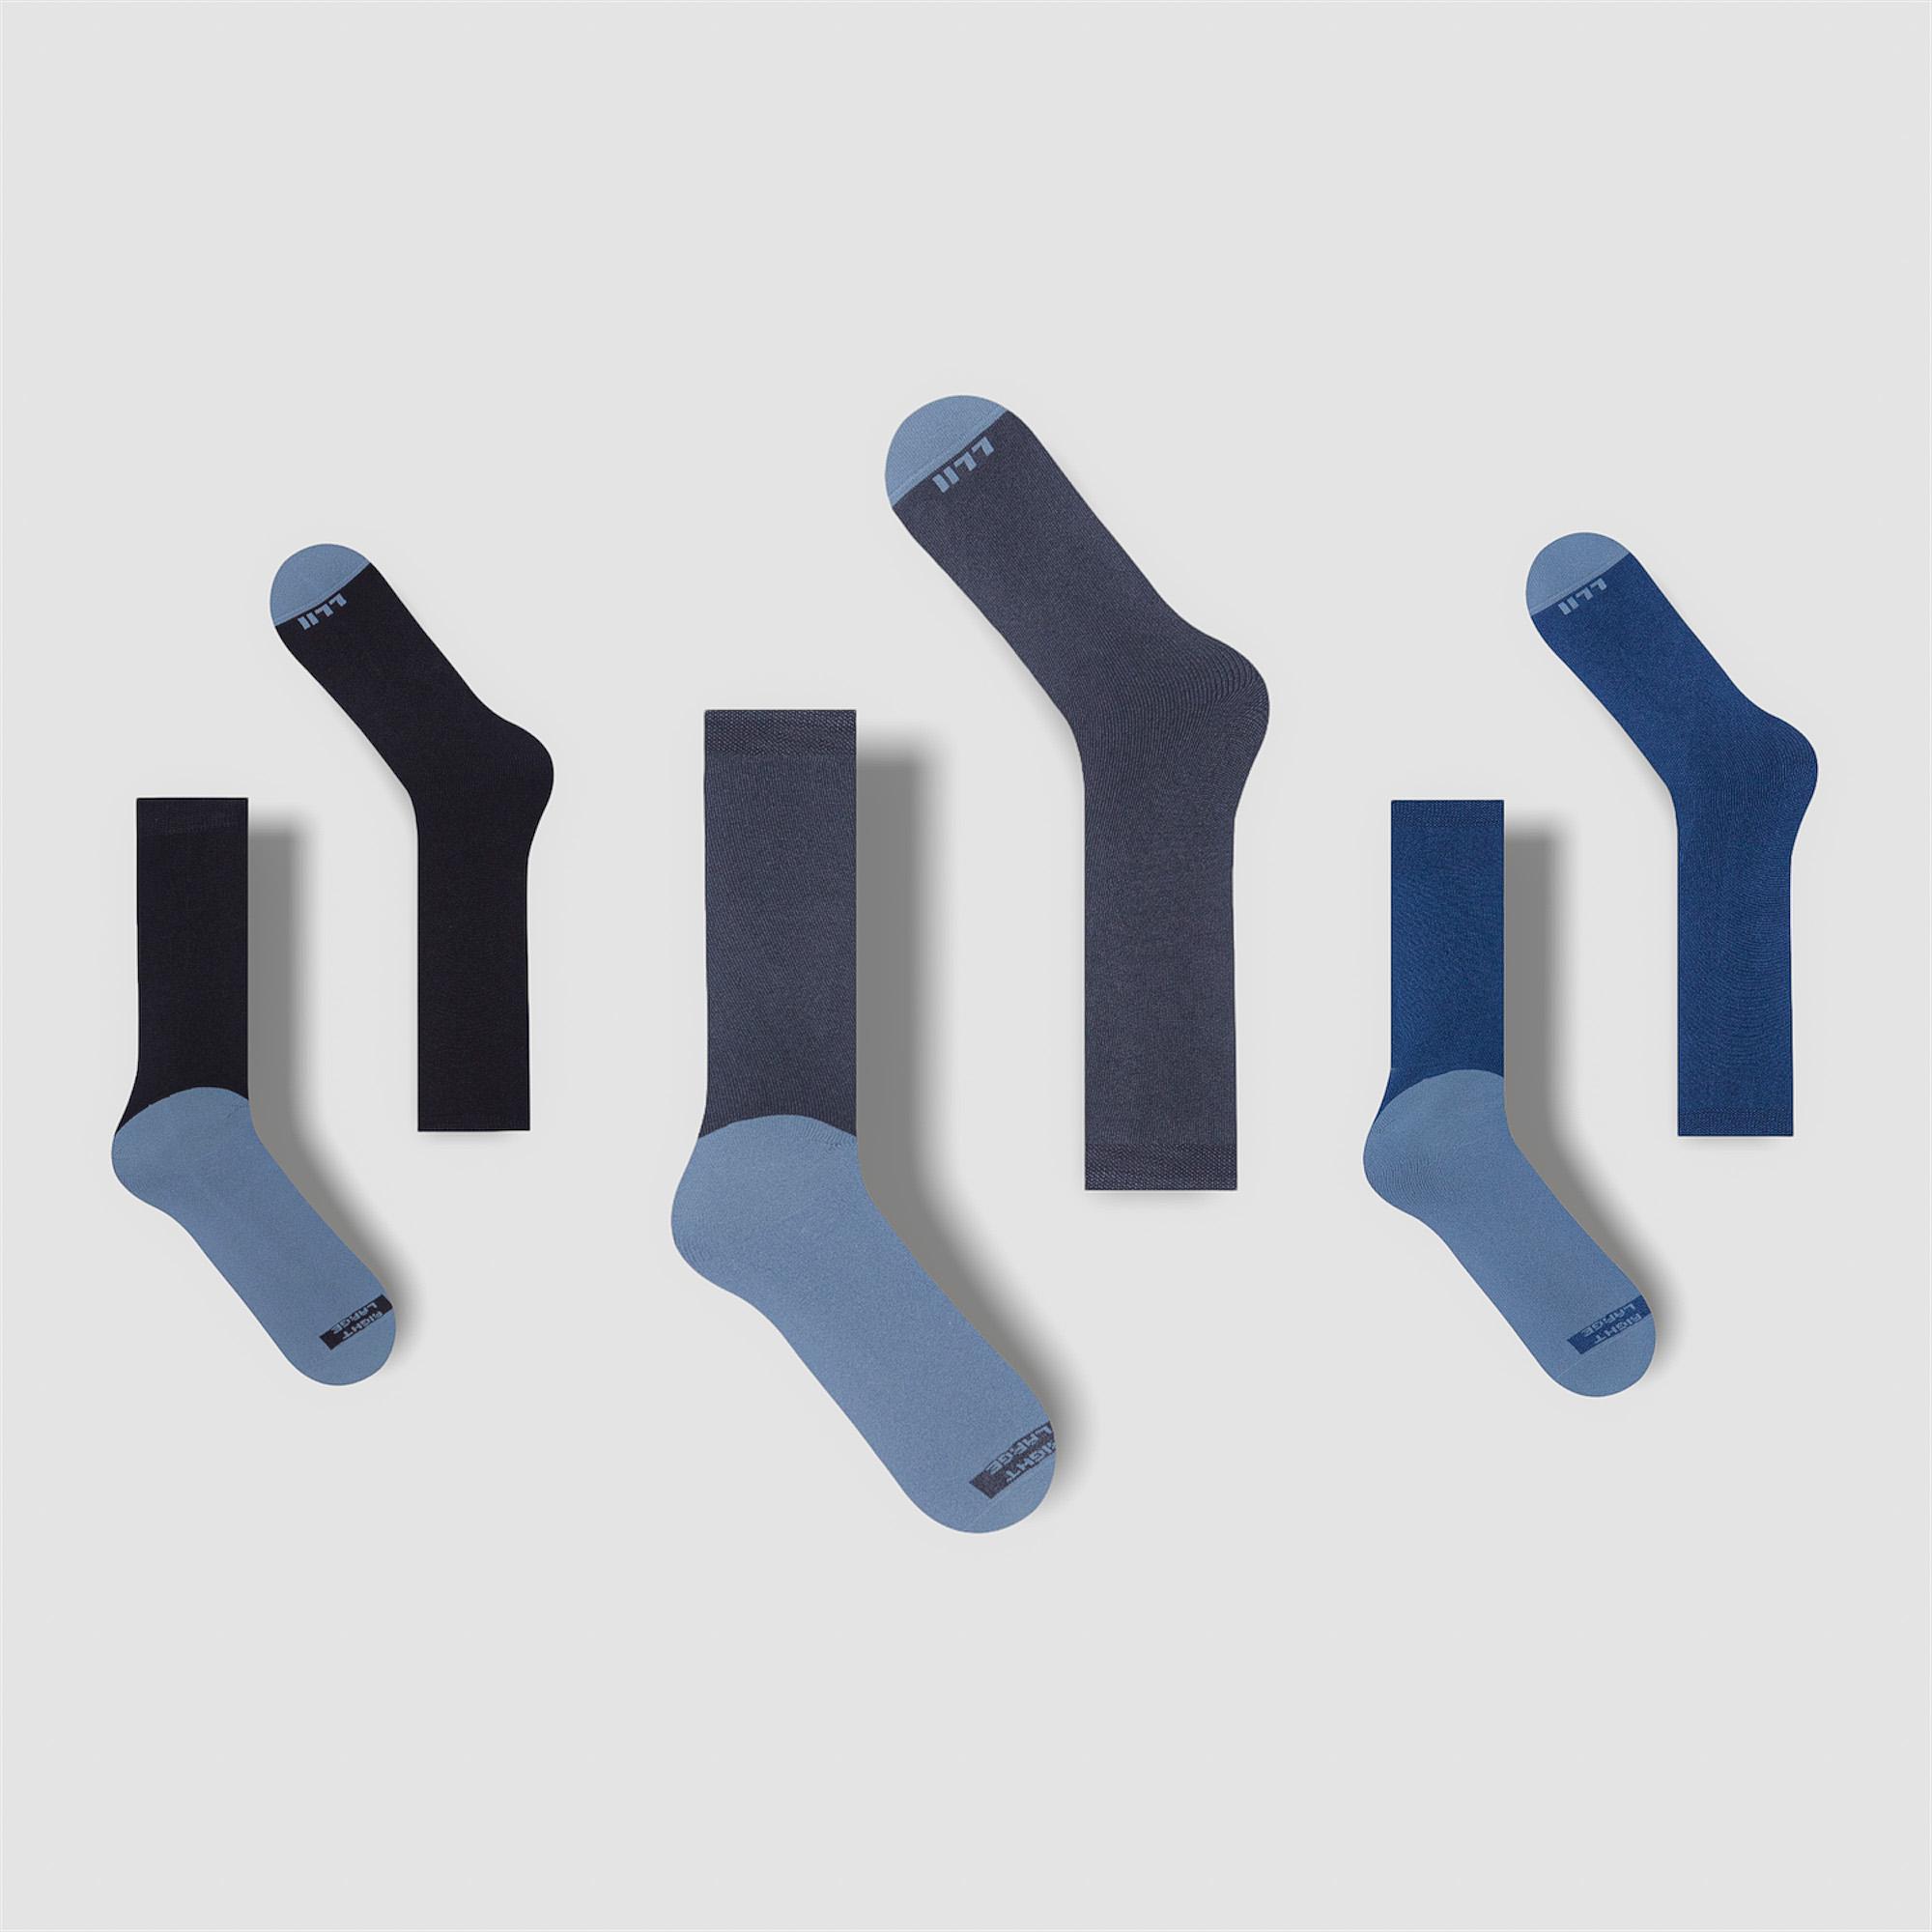 Comfy Multipack – 3 Pairs of Short Socks